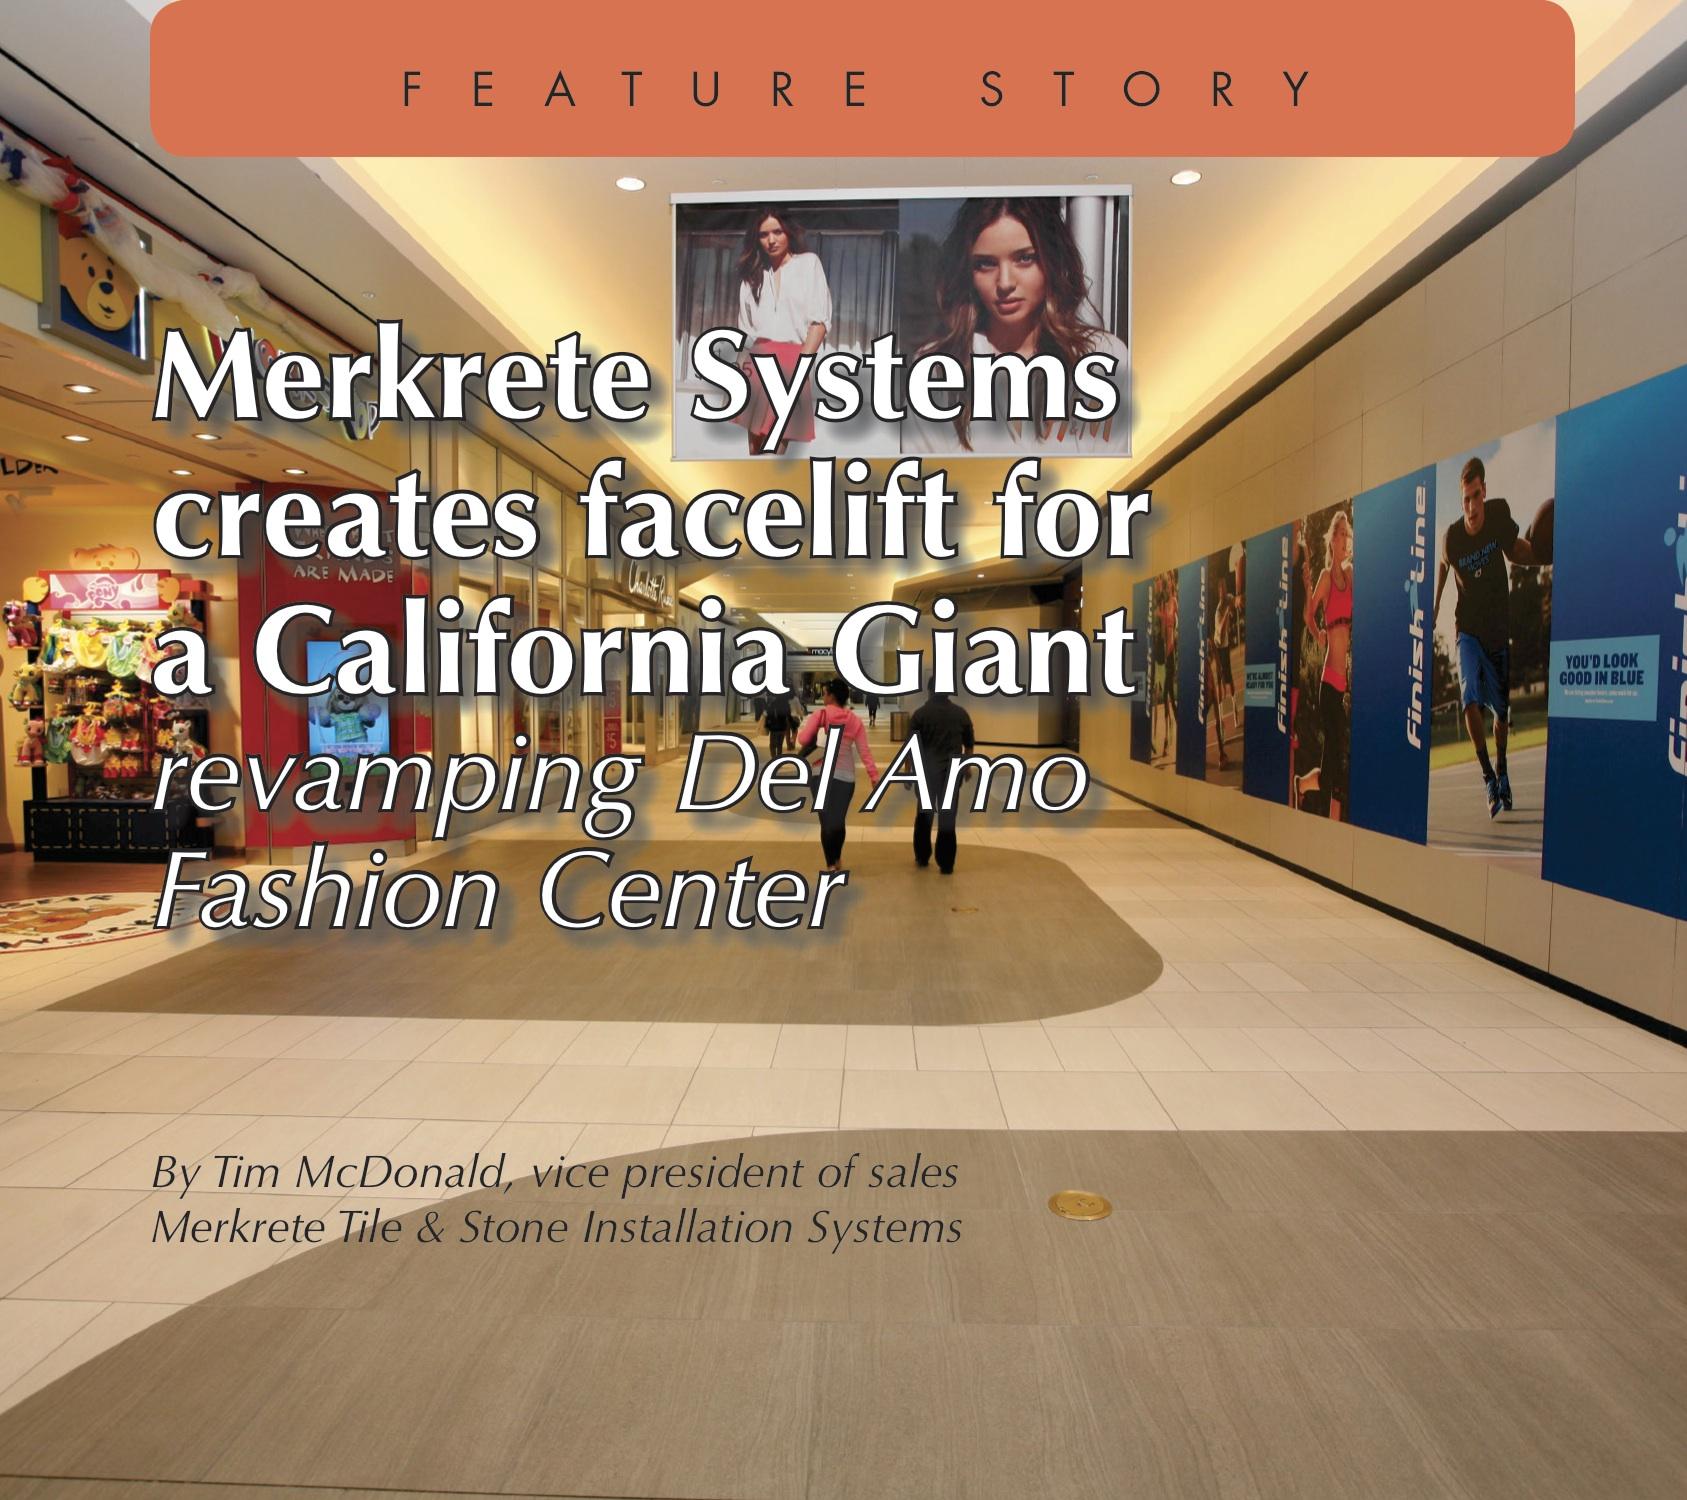 MERKRETE_feature